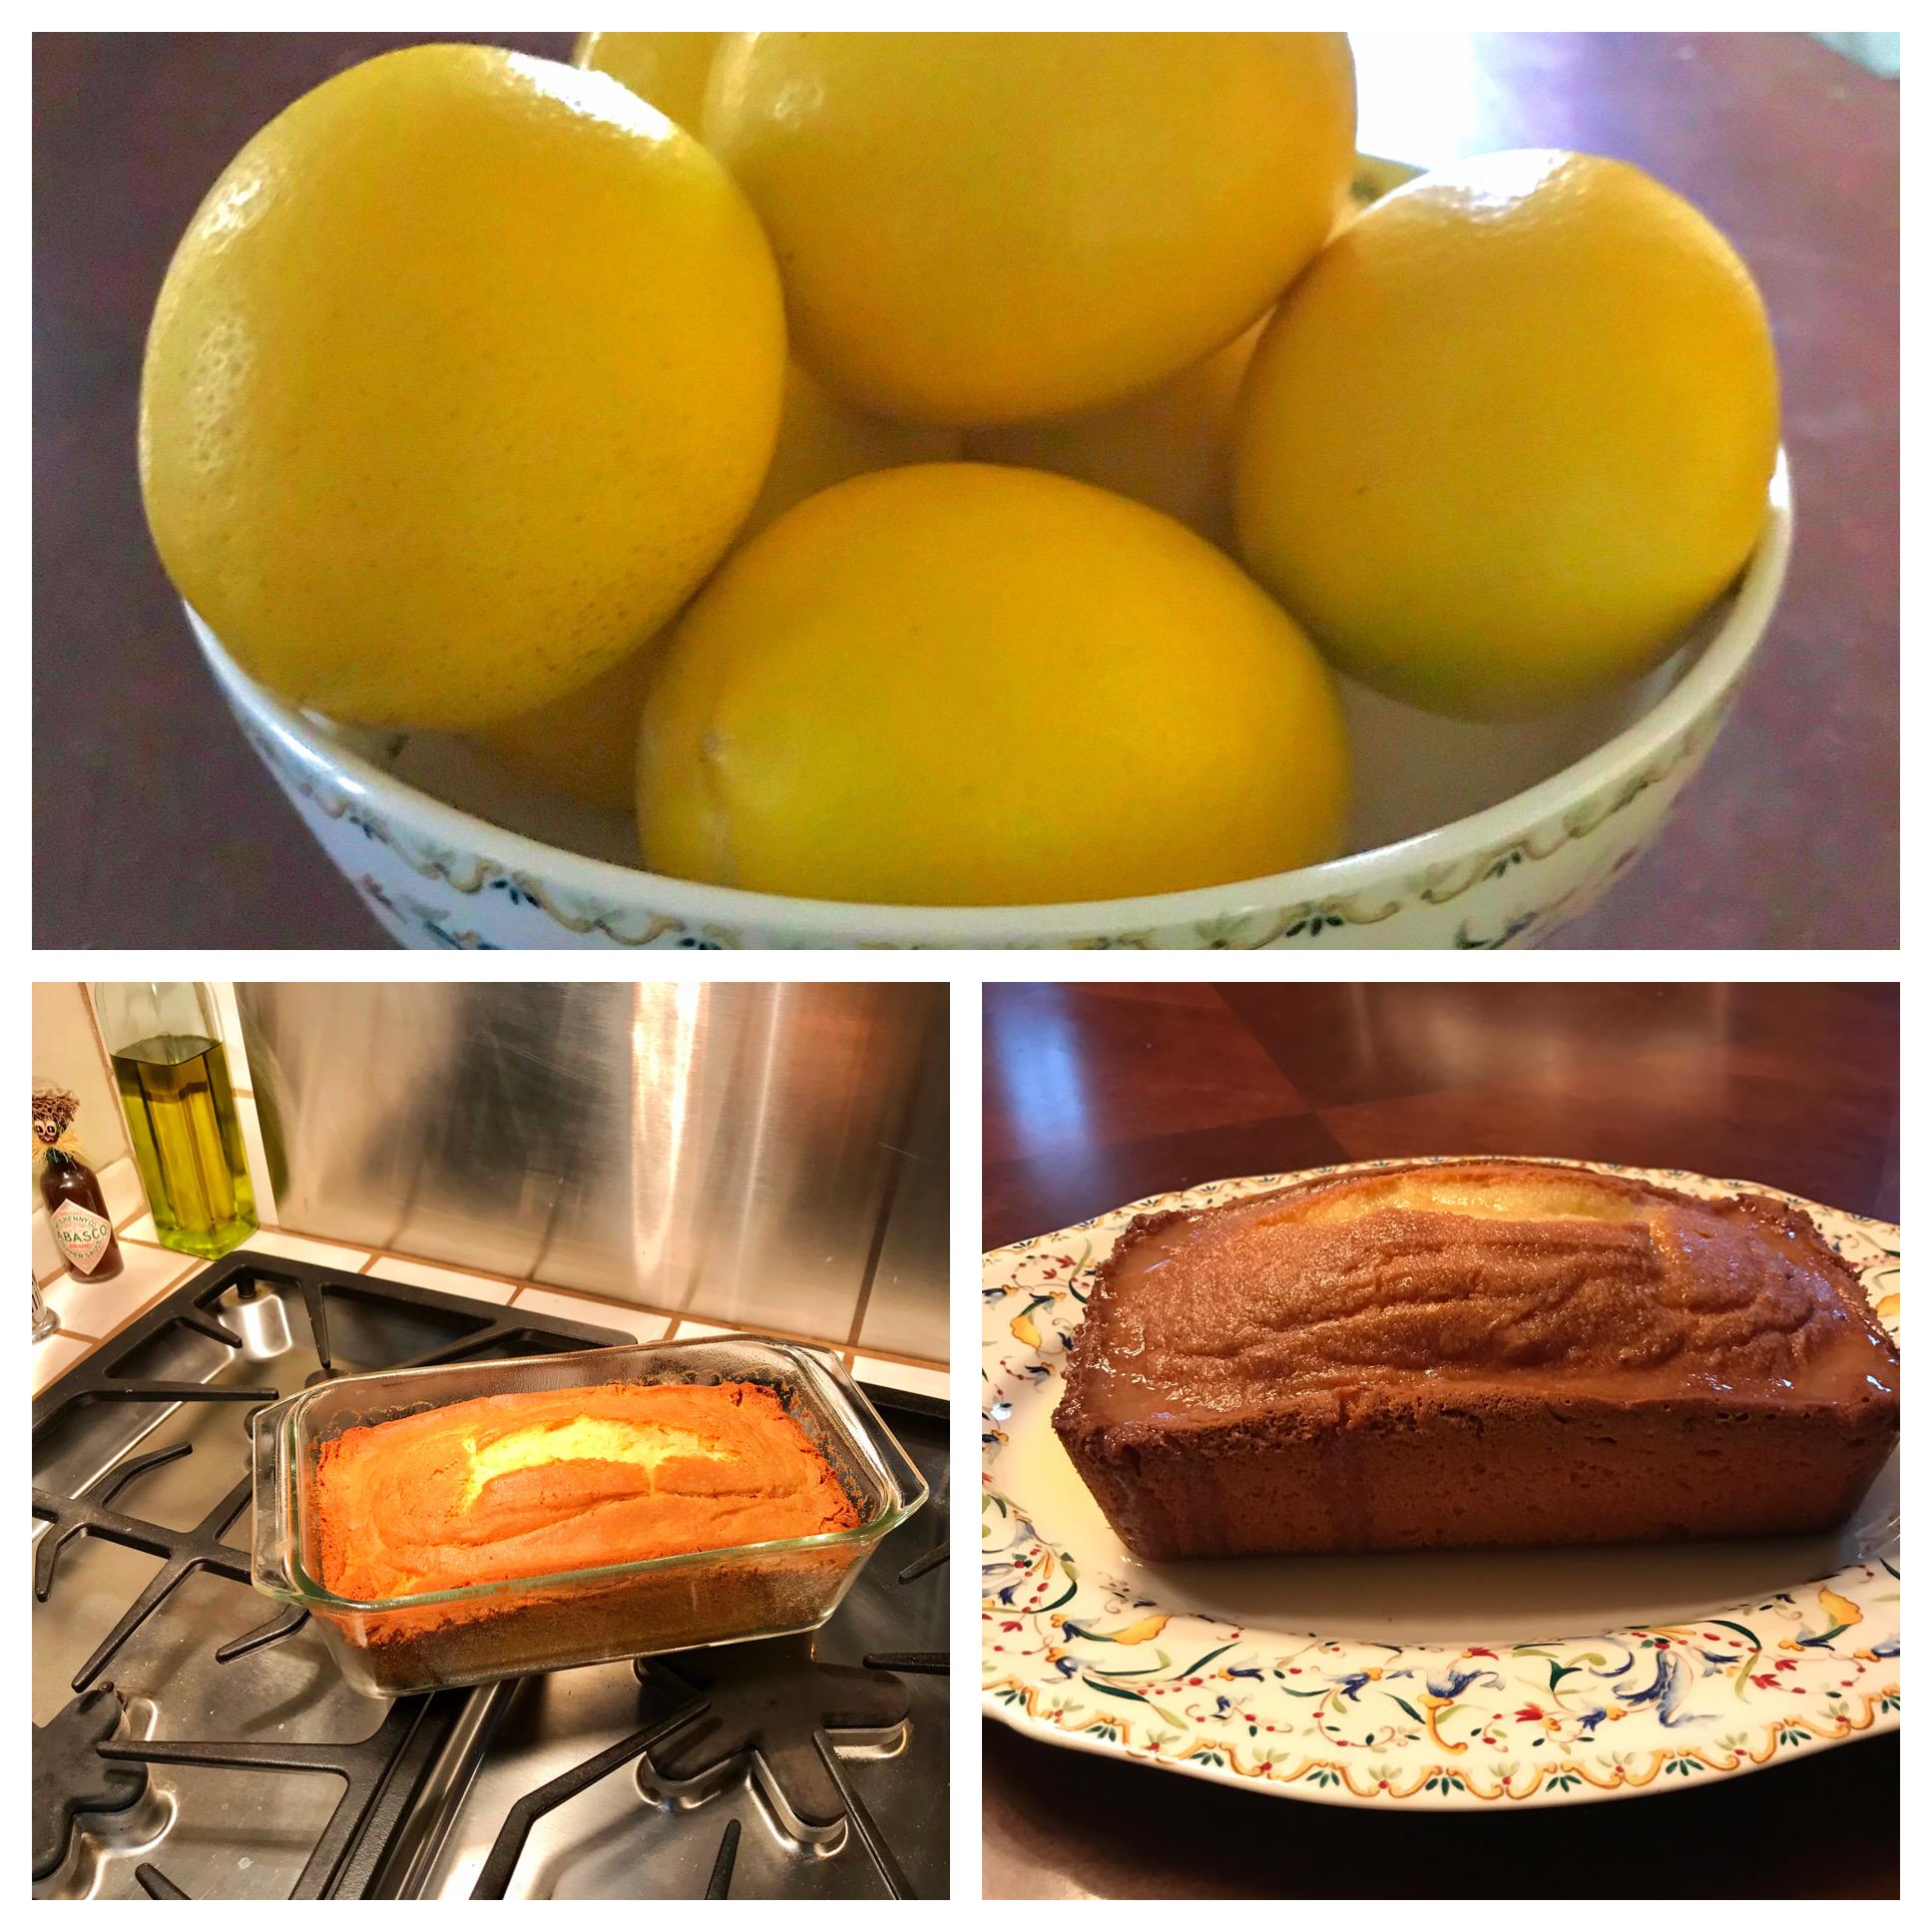 Lemon Bread Molly Gray